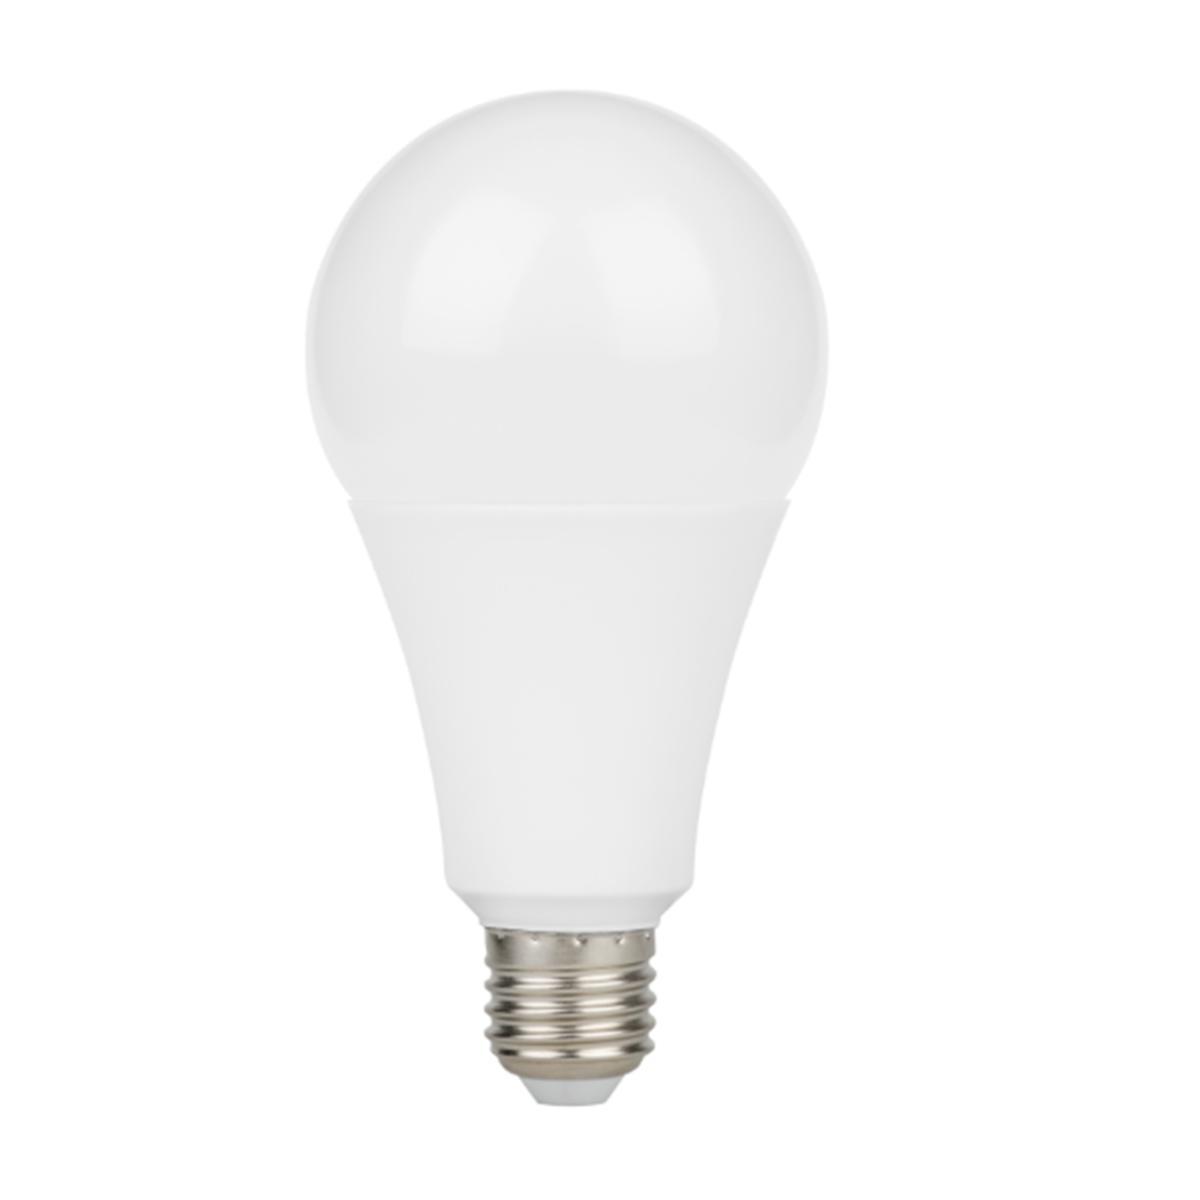 SILAMP Ampoule LED E27 9W A60 220V 230° - Blanc Neutre 4000K - 5500K